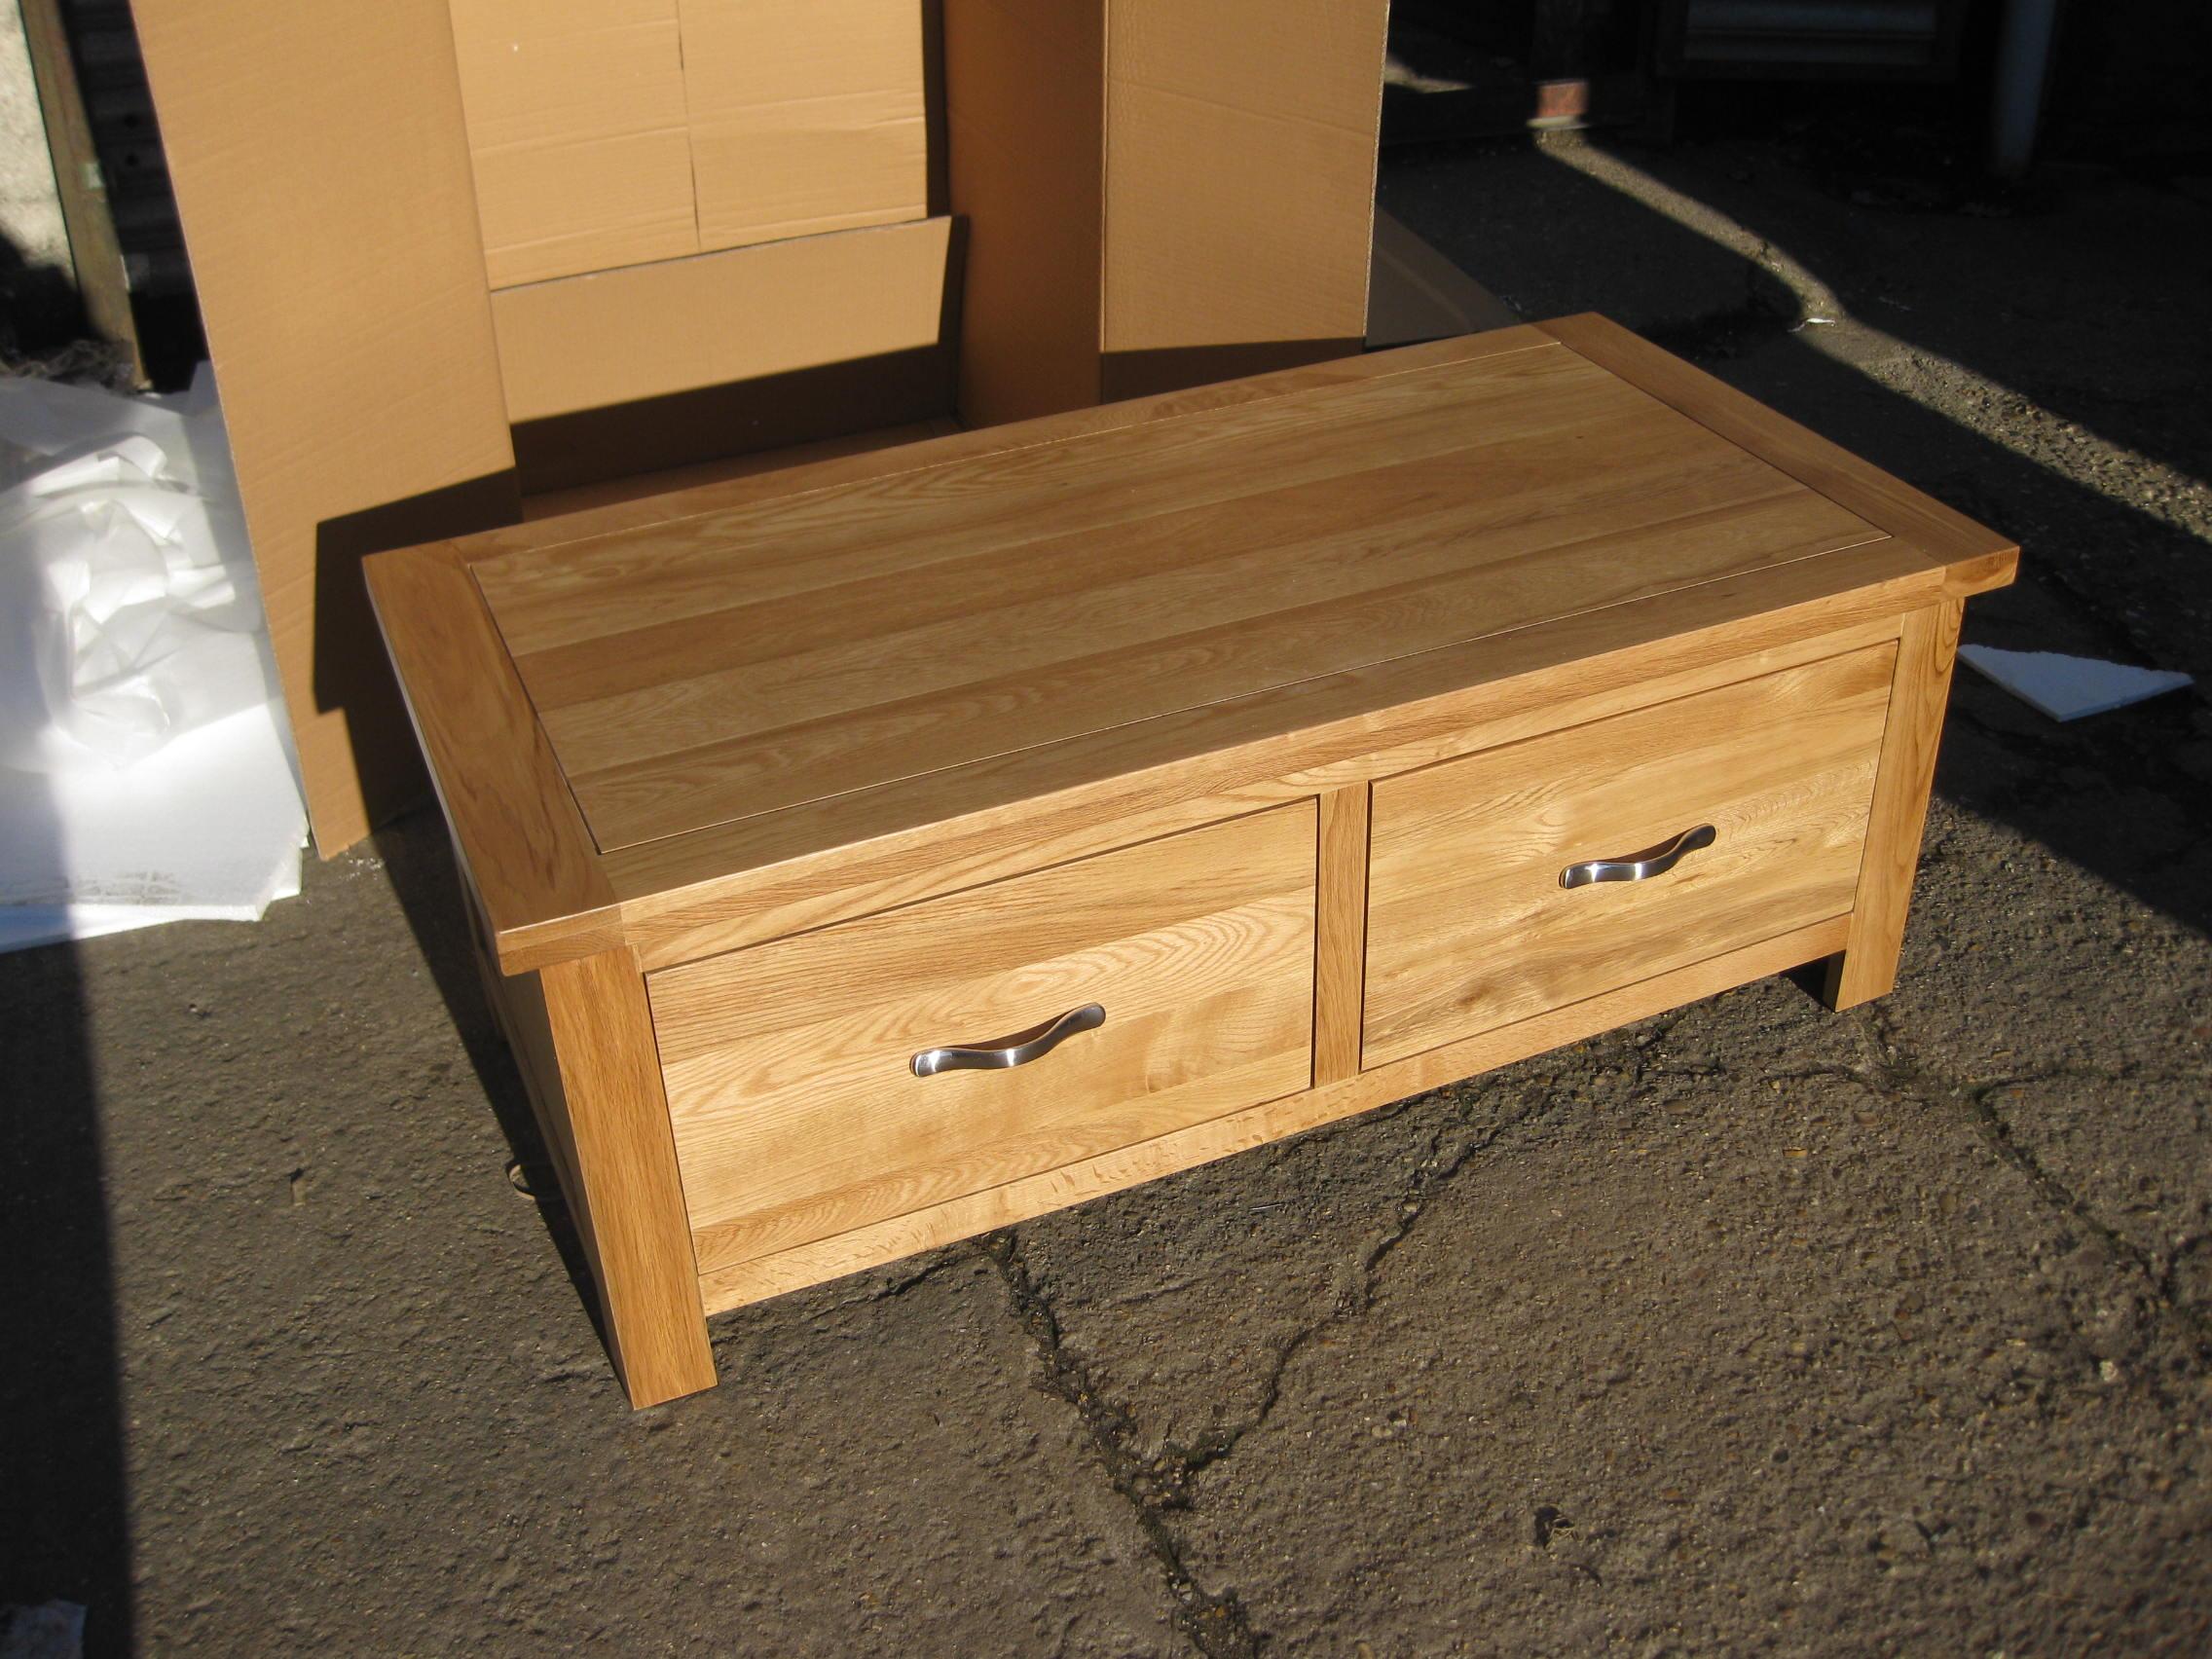 Light Oak Coffee Table Draws Storage Furniture Blanket Box Lounge Solid New Ebay